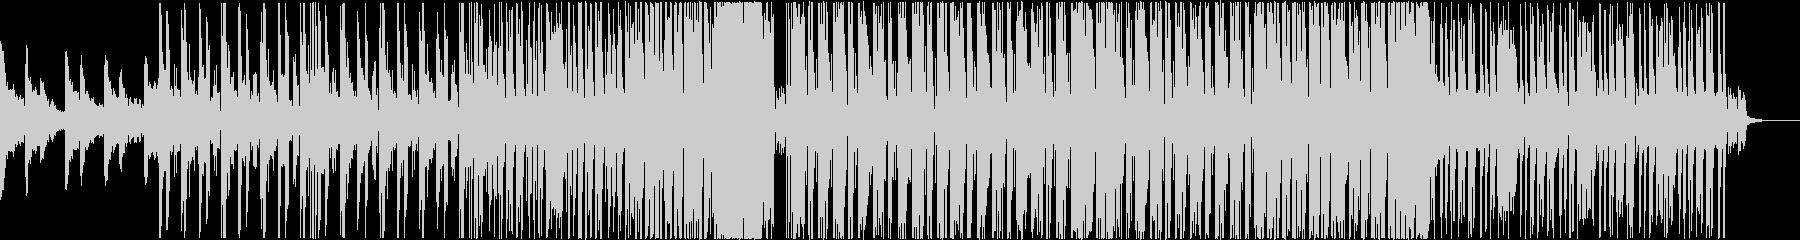 Kawaii系Future Bass 2の未再生の波形